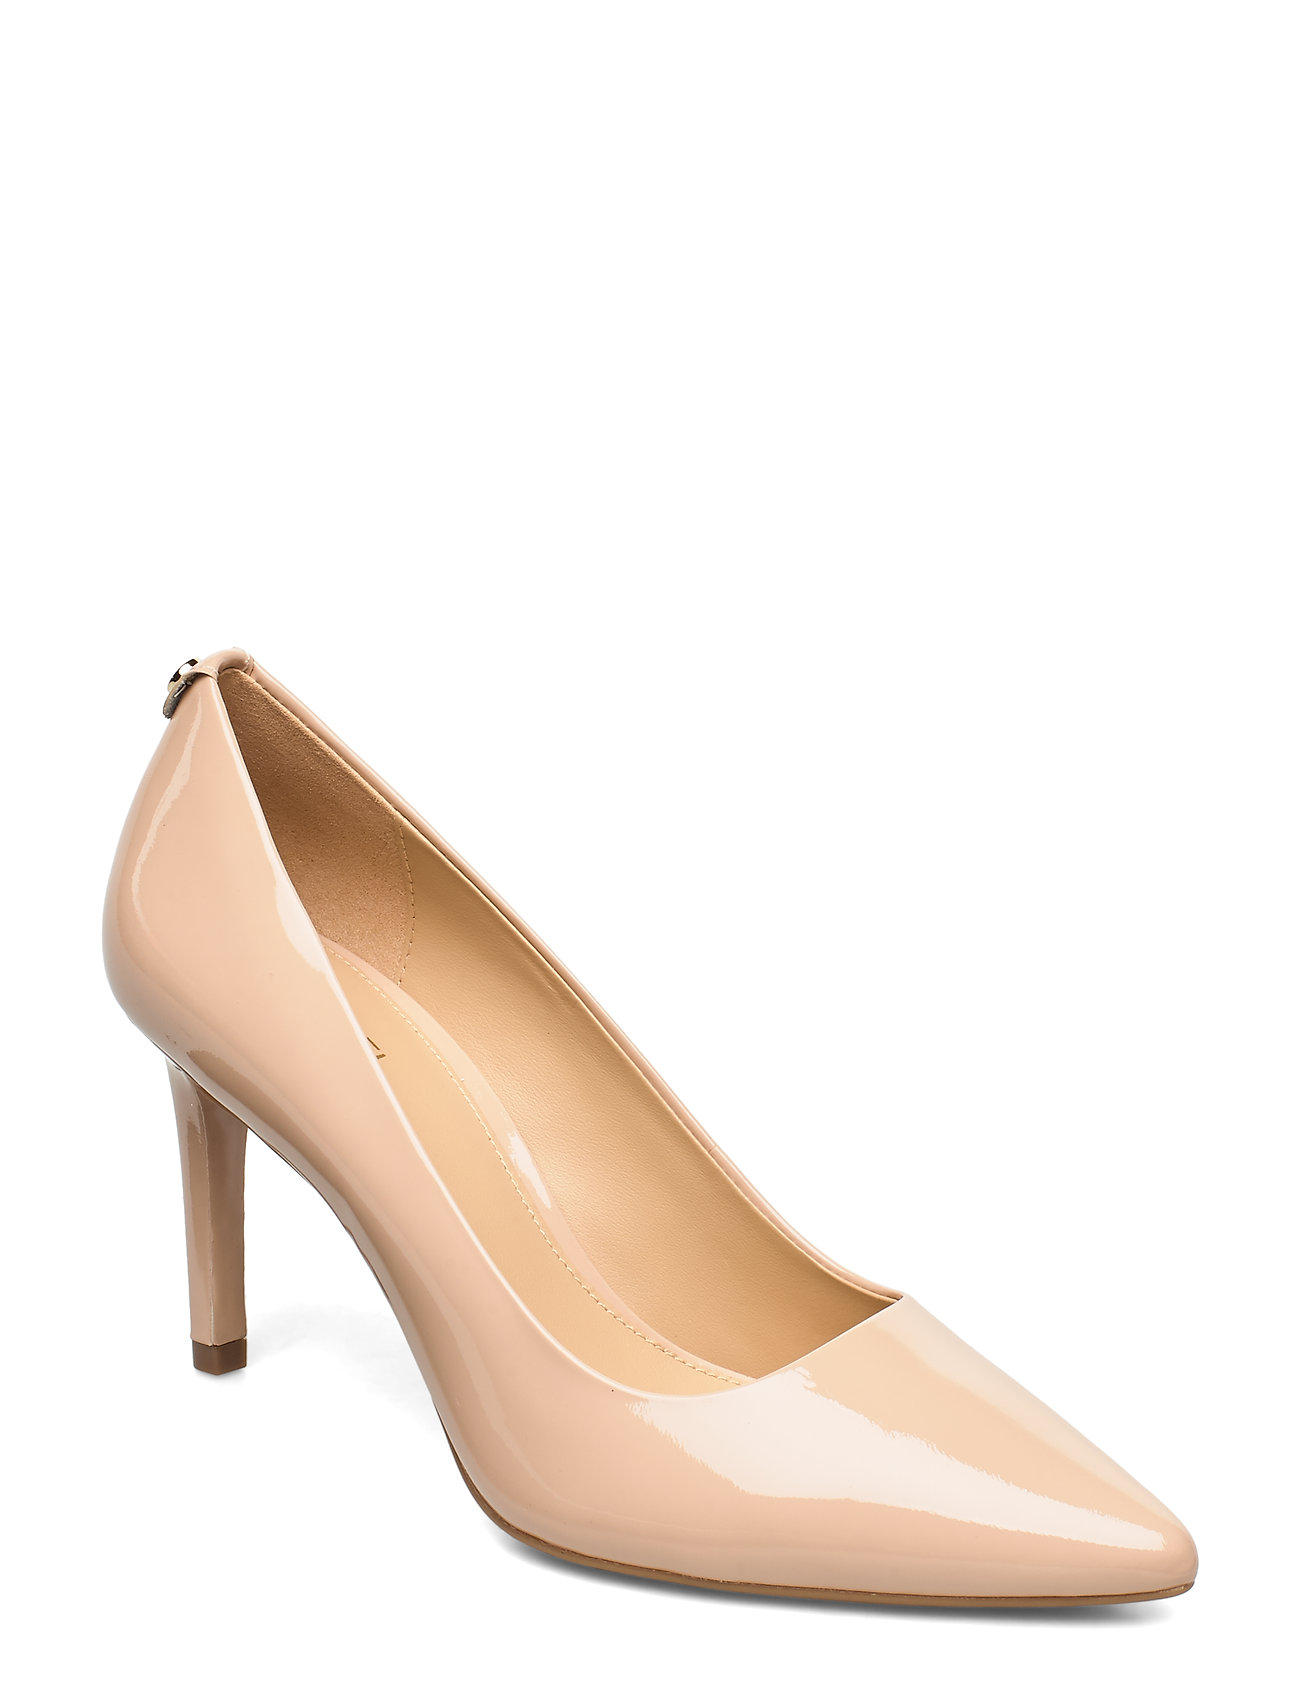 Michael Kors Shoes DOROTHY FLEX PUMP - LT BLUSH